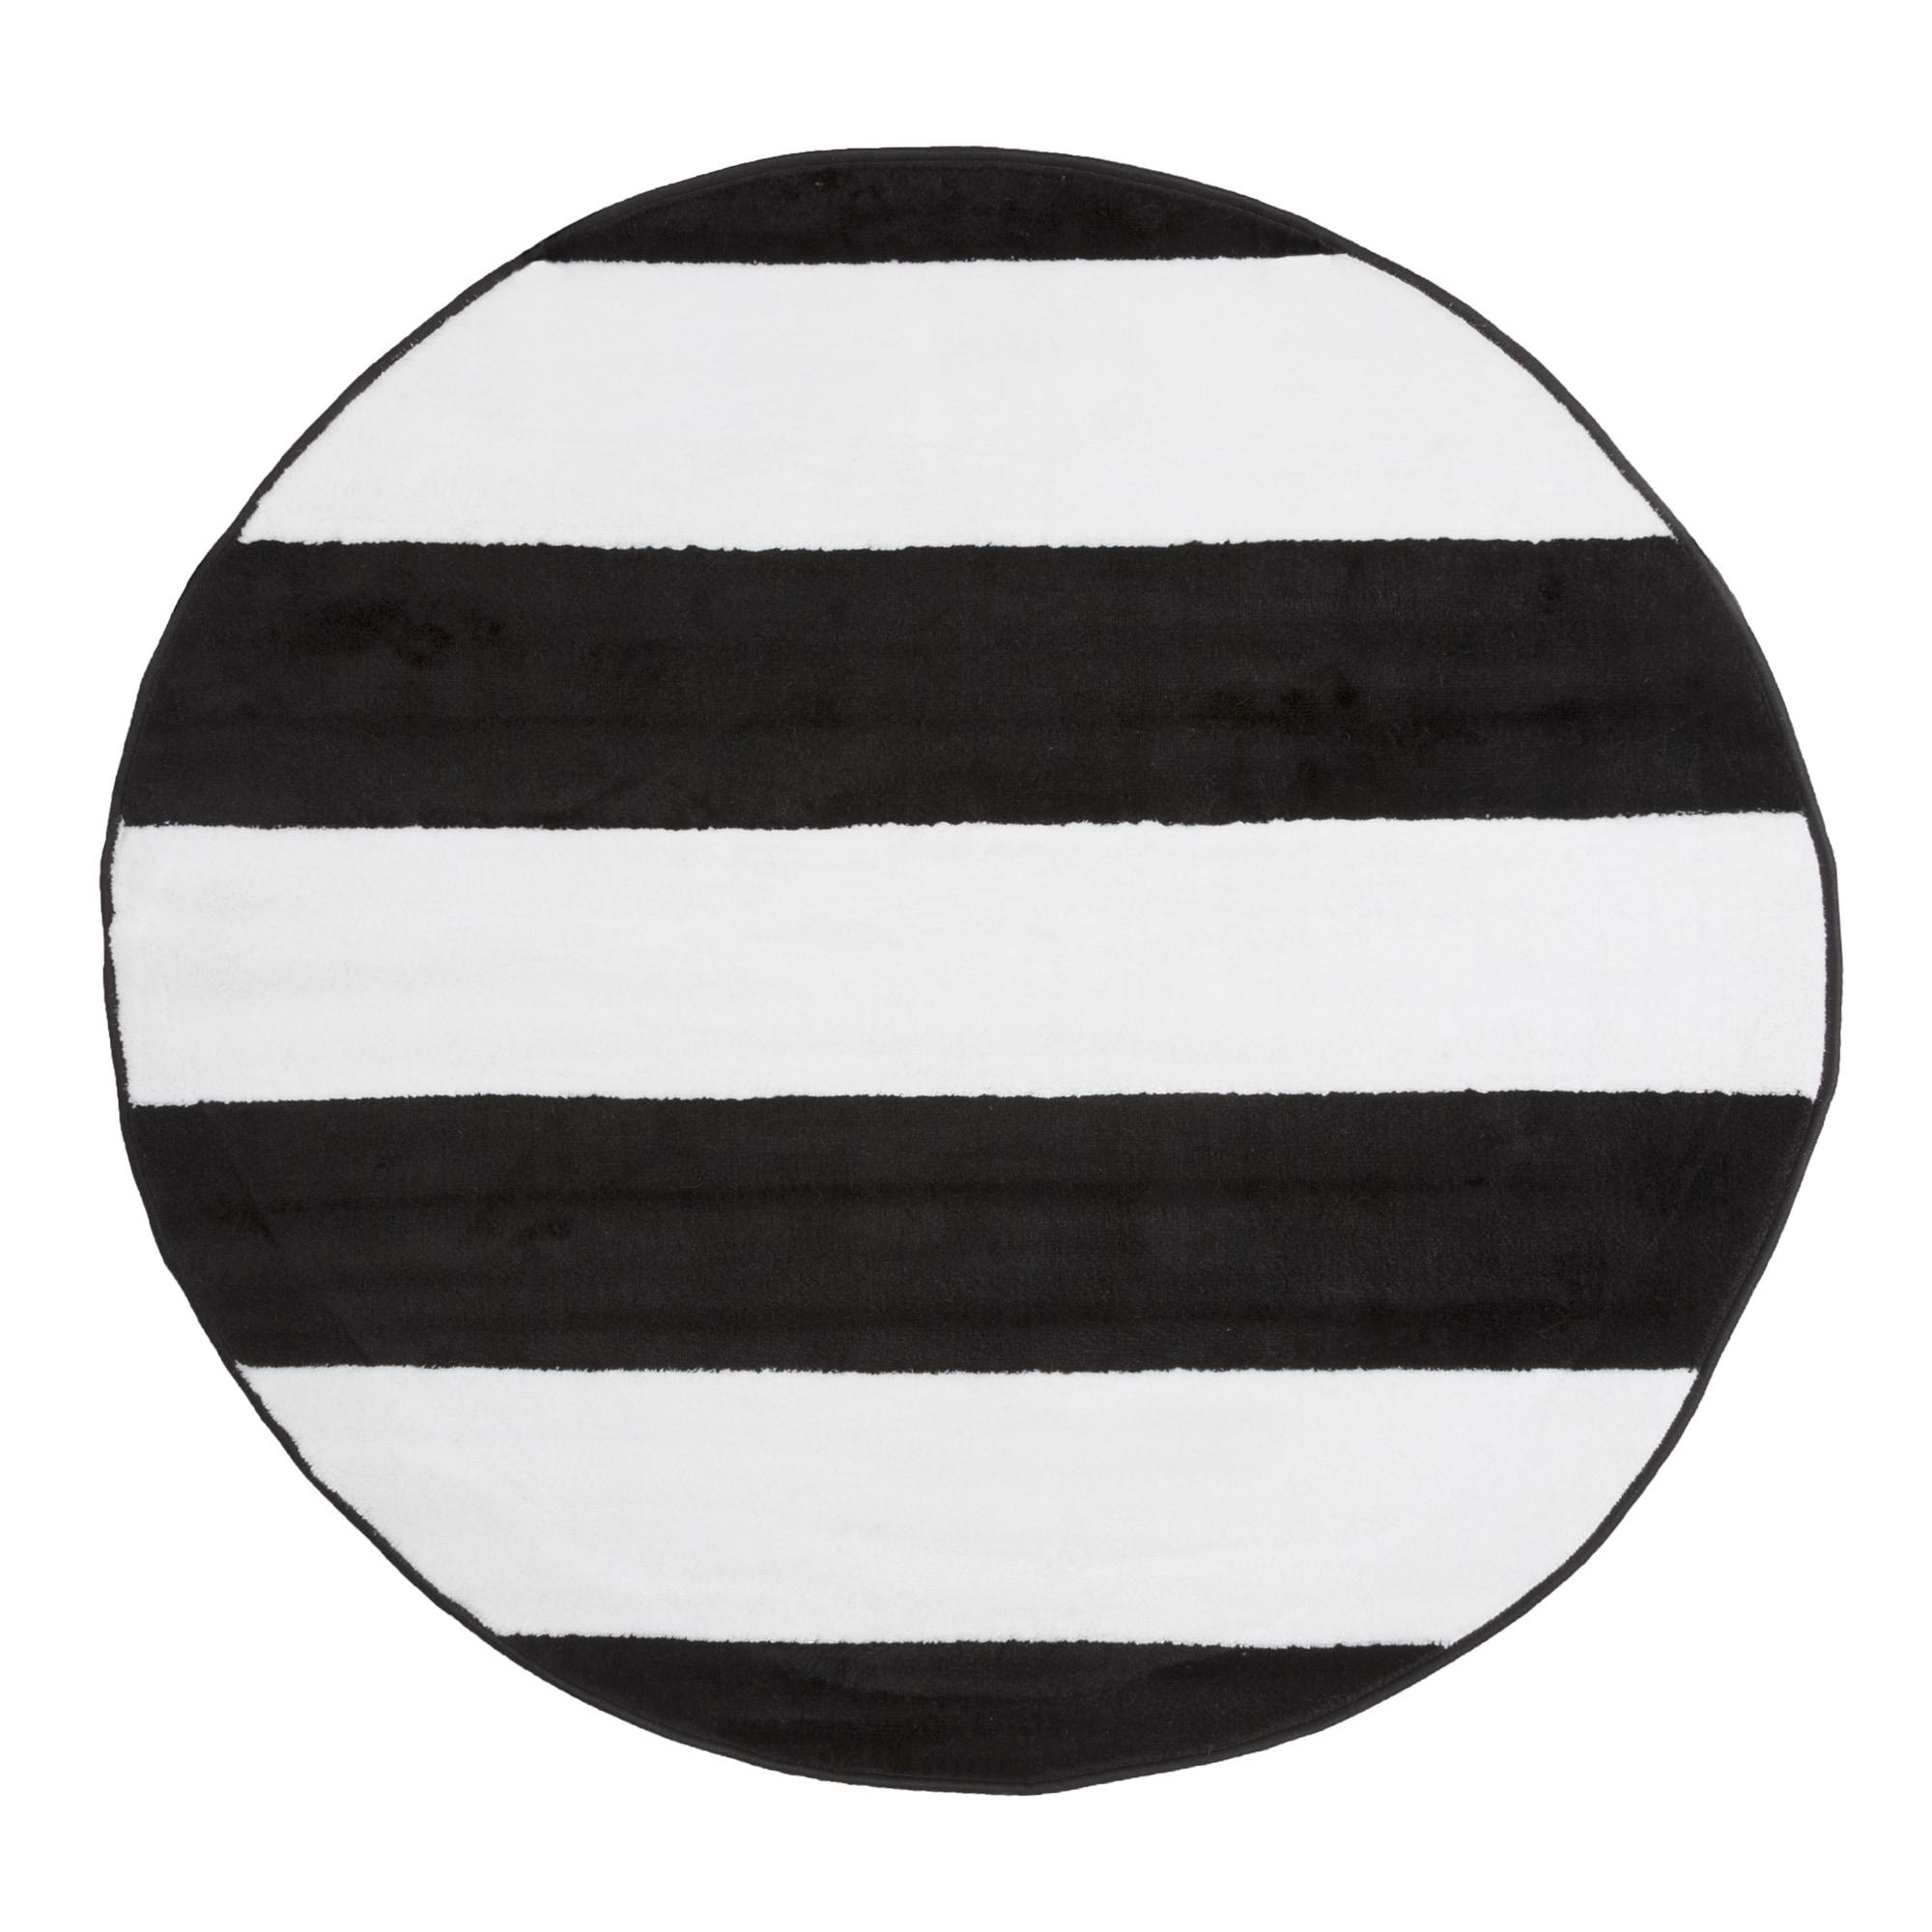 Windsor Home Breton Stripe Area Rug Black White 5 Round